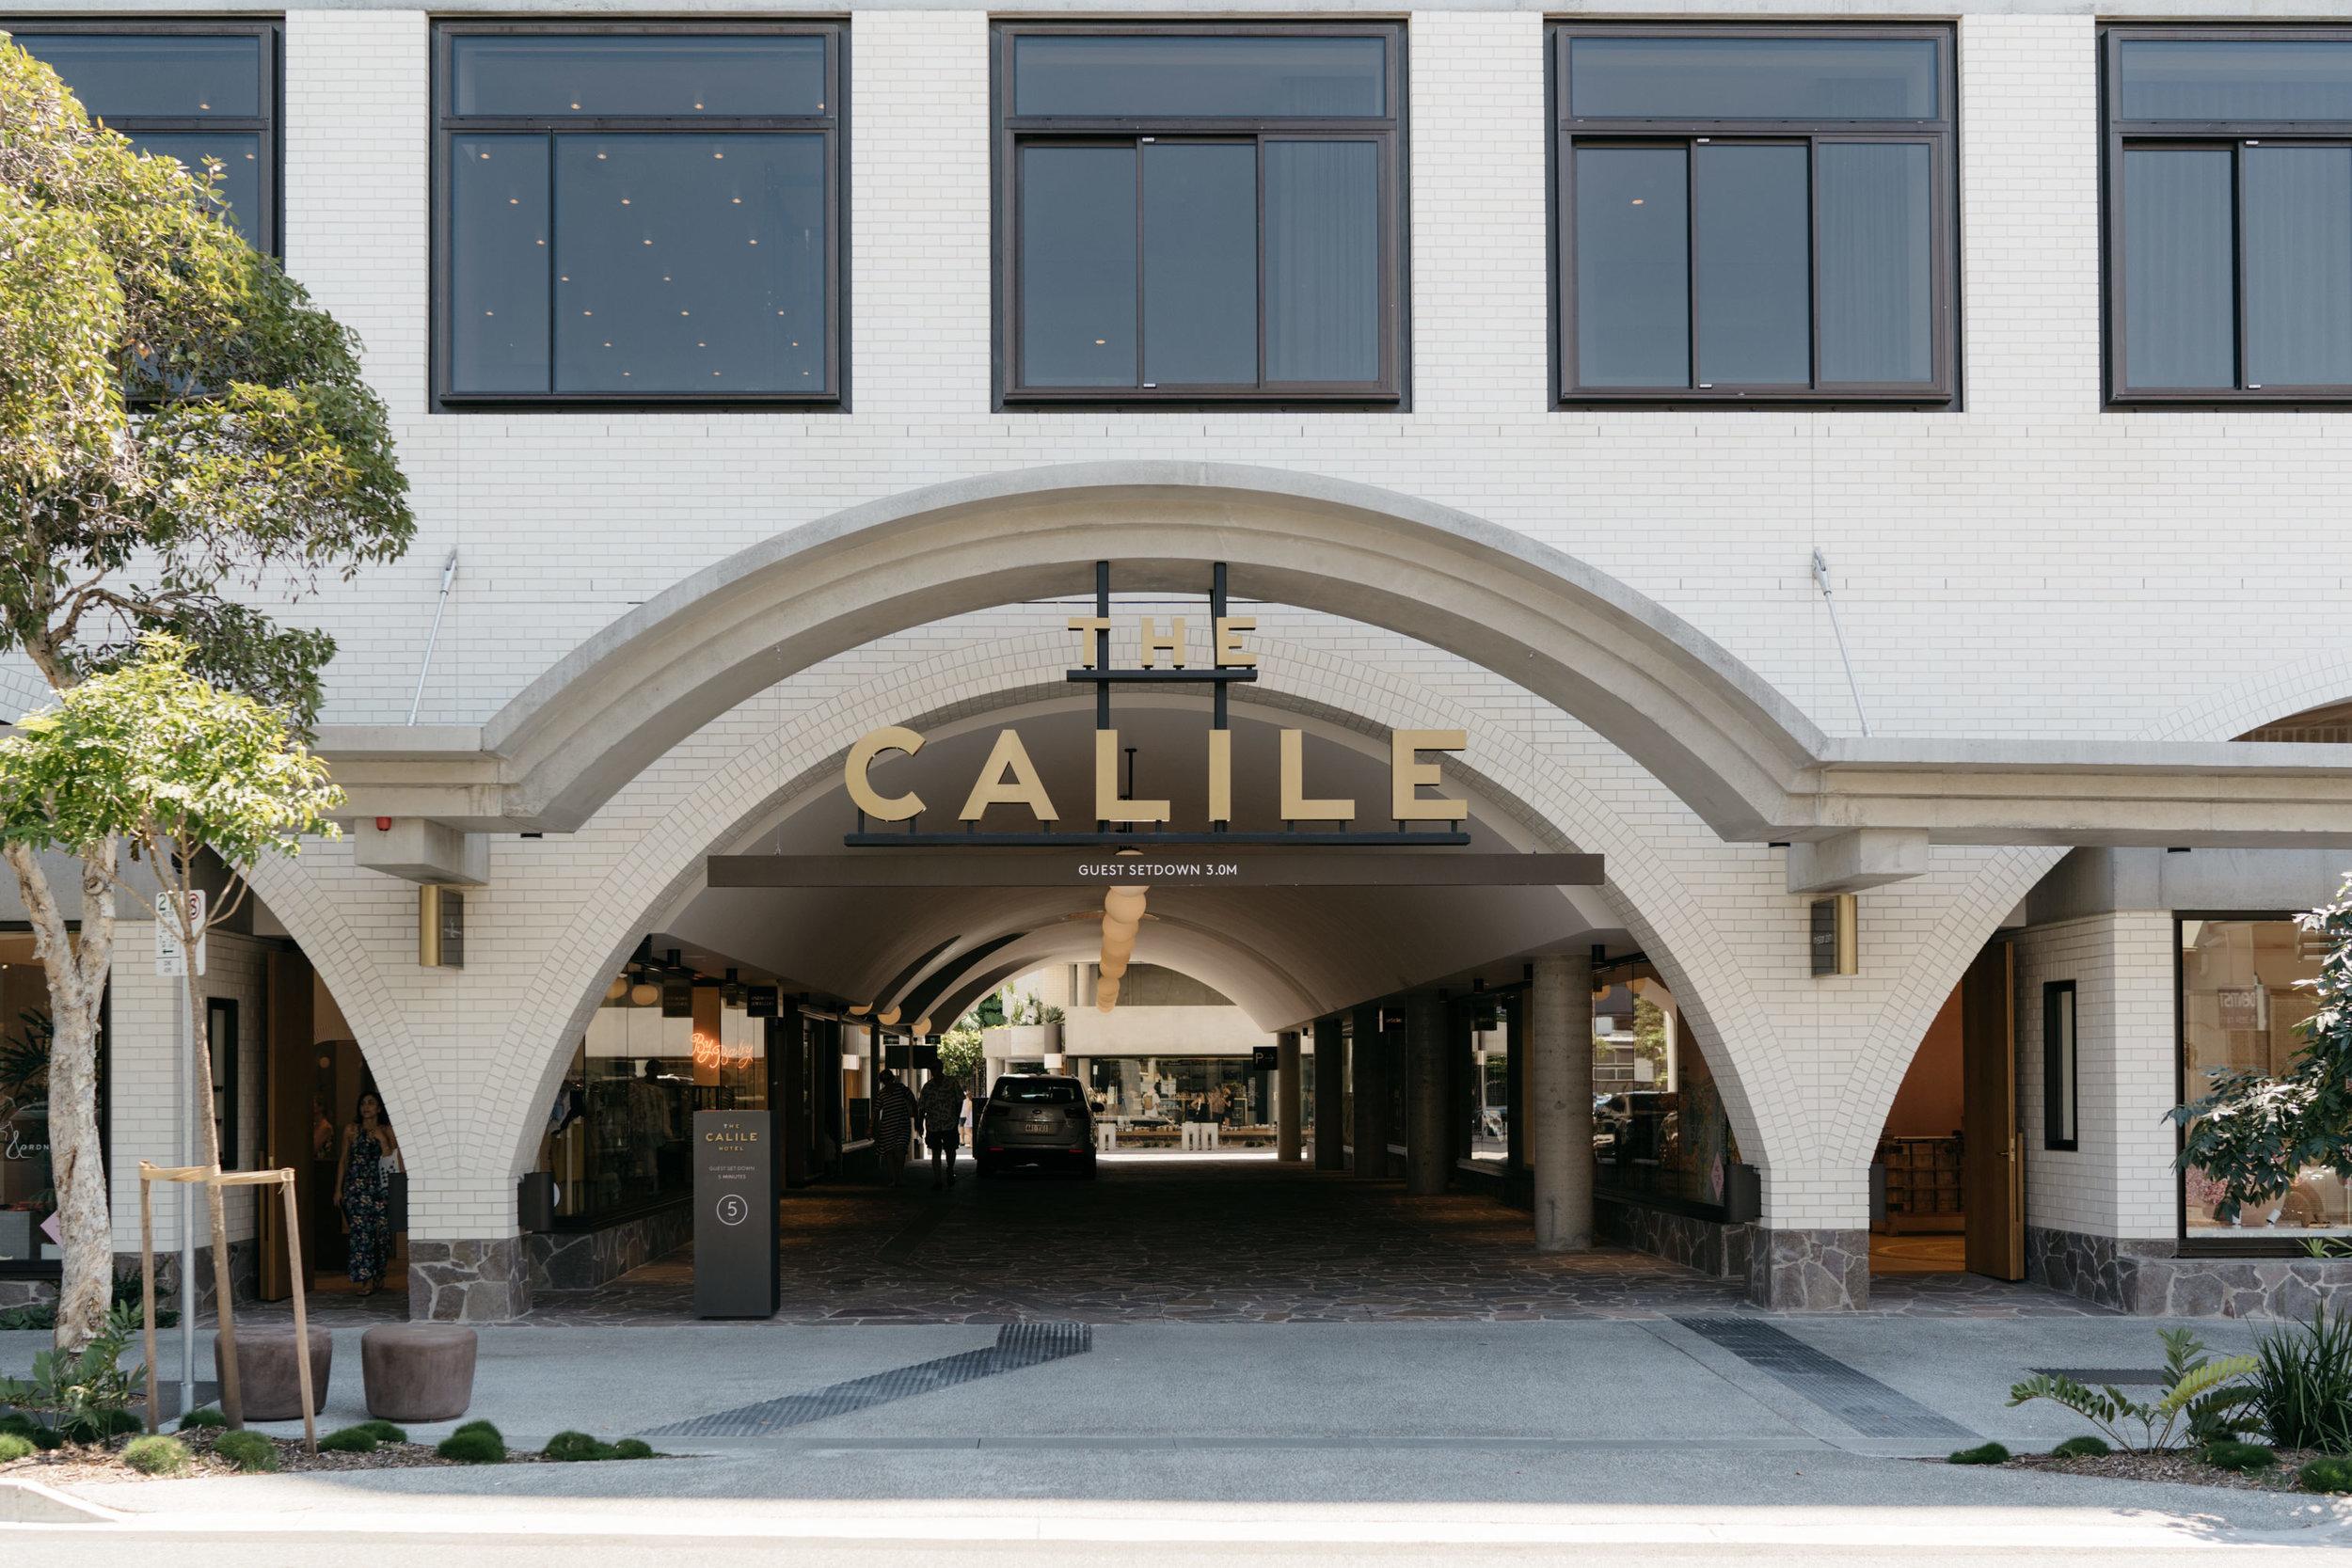 The Calile Hotel, Brisbane Wedding, Ephemeral Creative